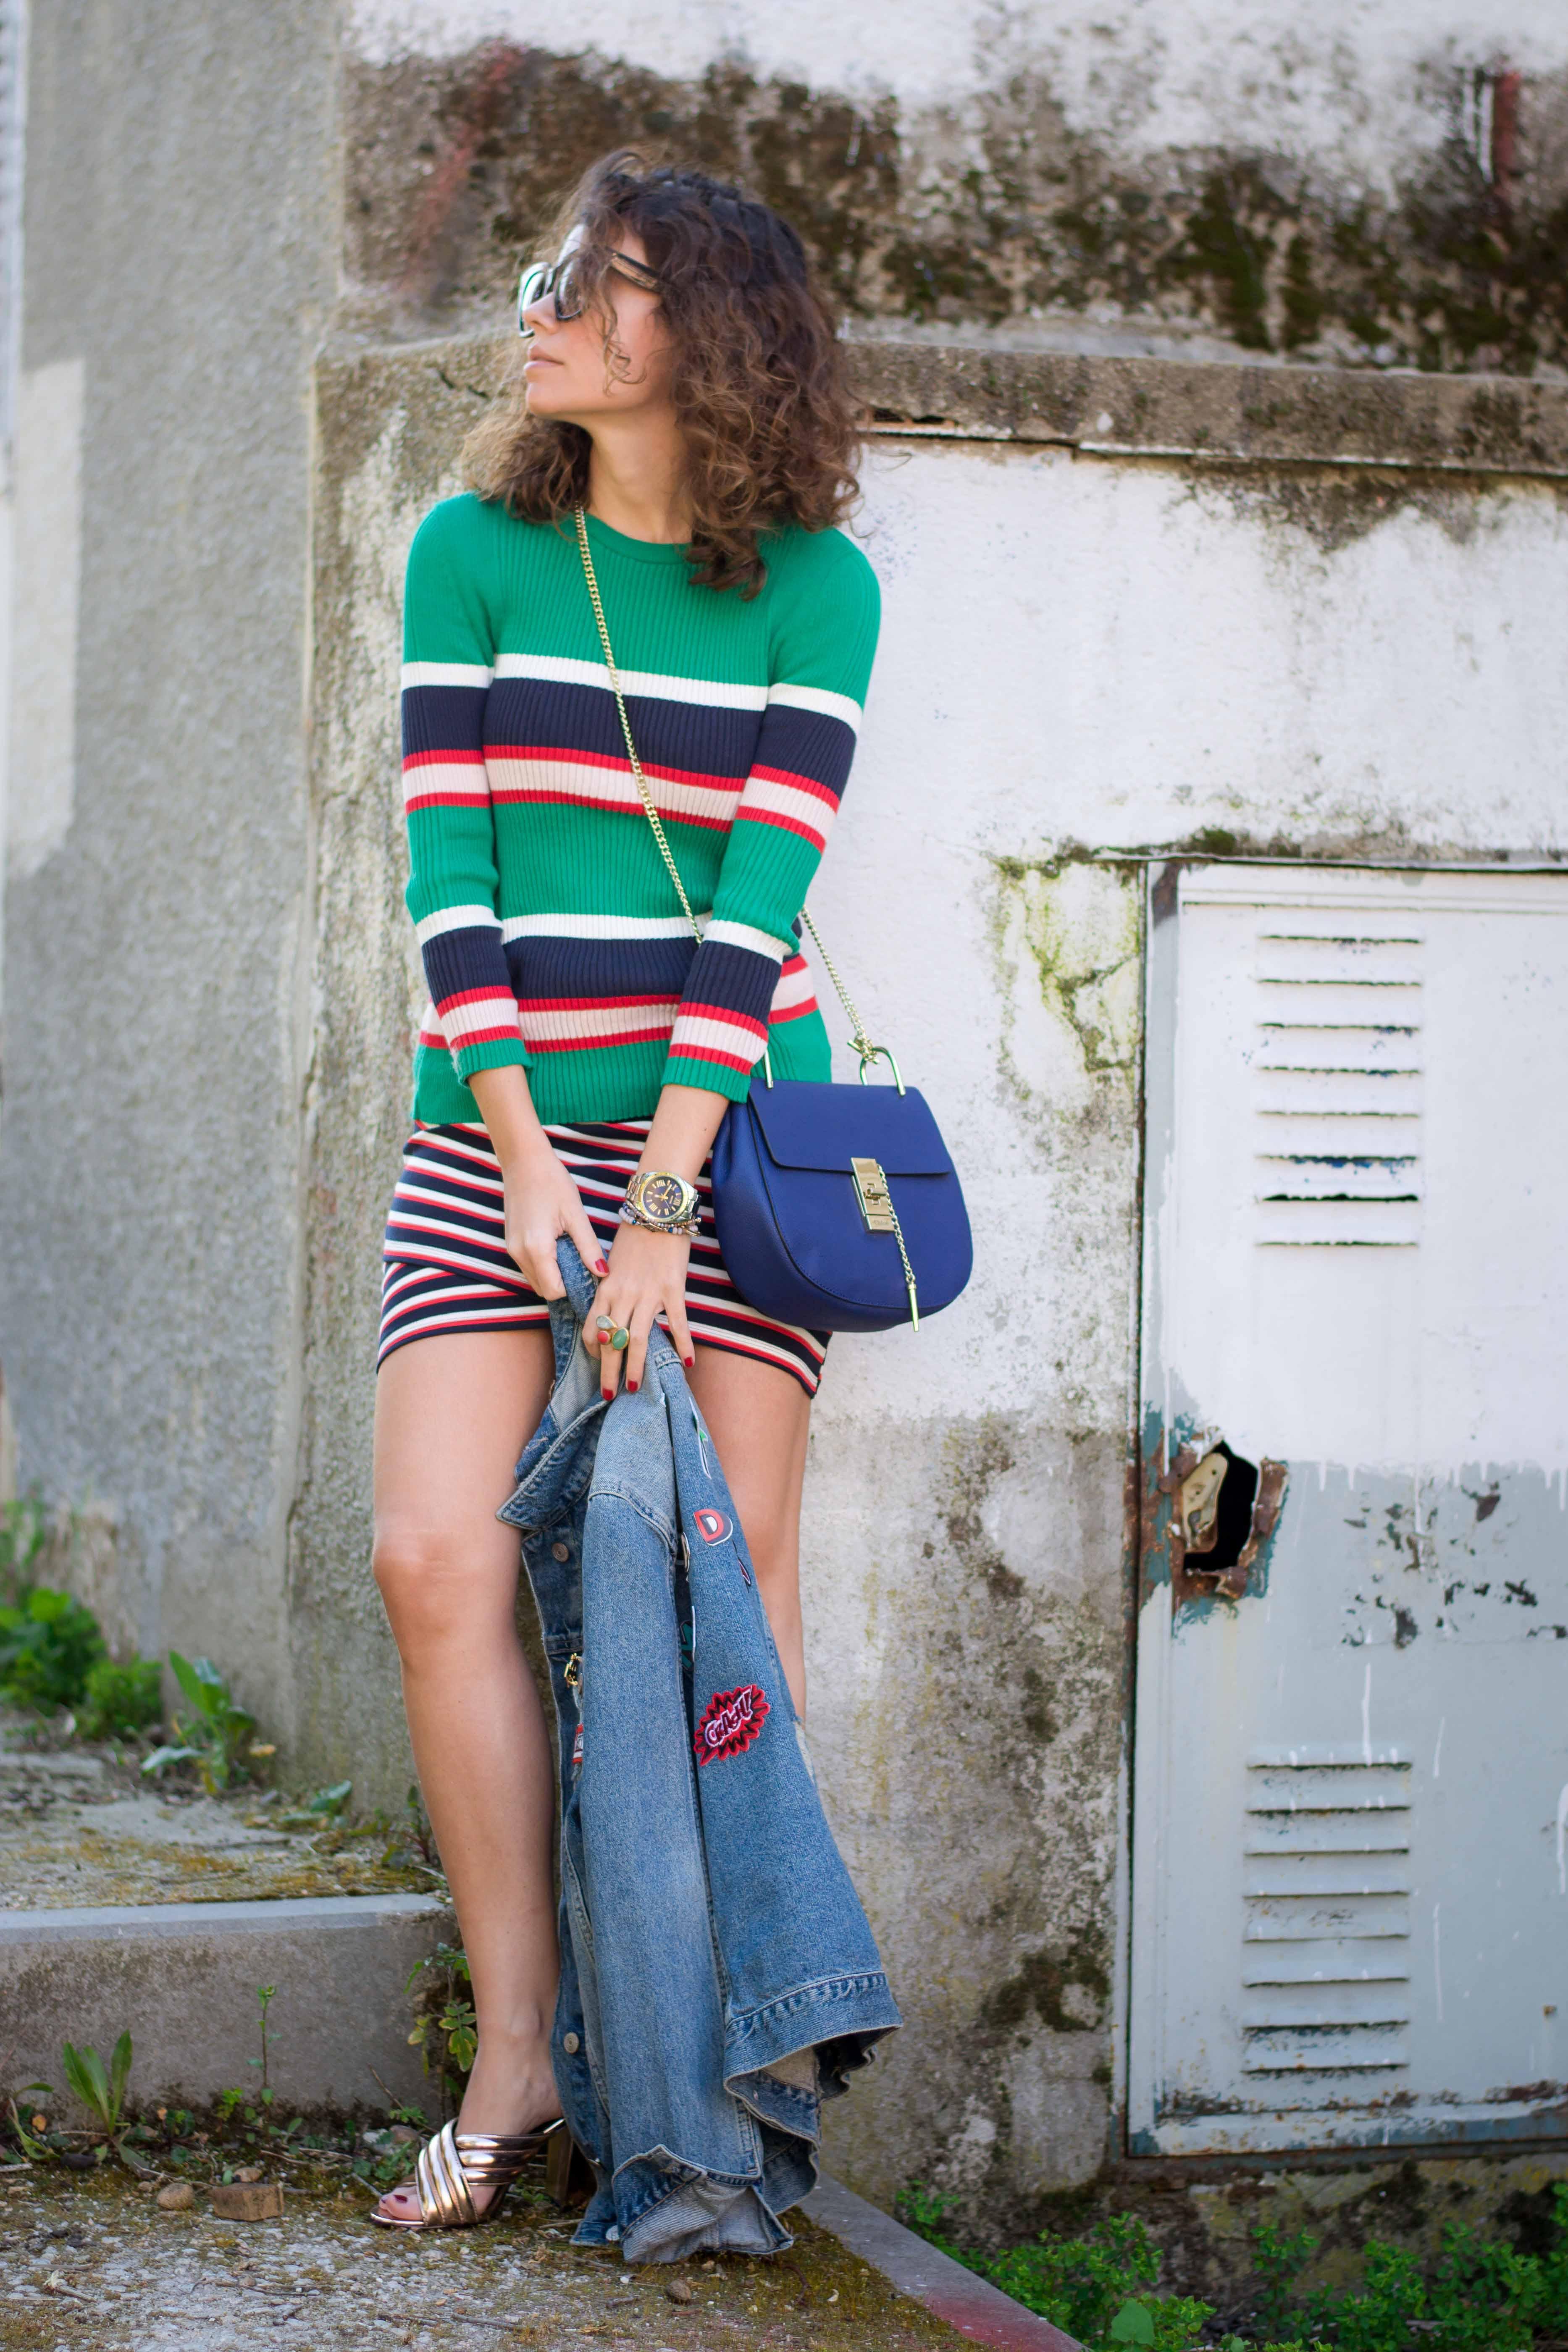 stripes_vibes_ss16_summer_pines_streetstyle_cool_lemonade_blogger